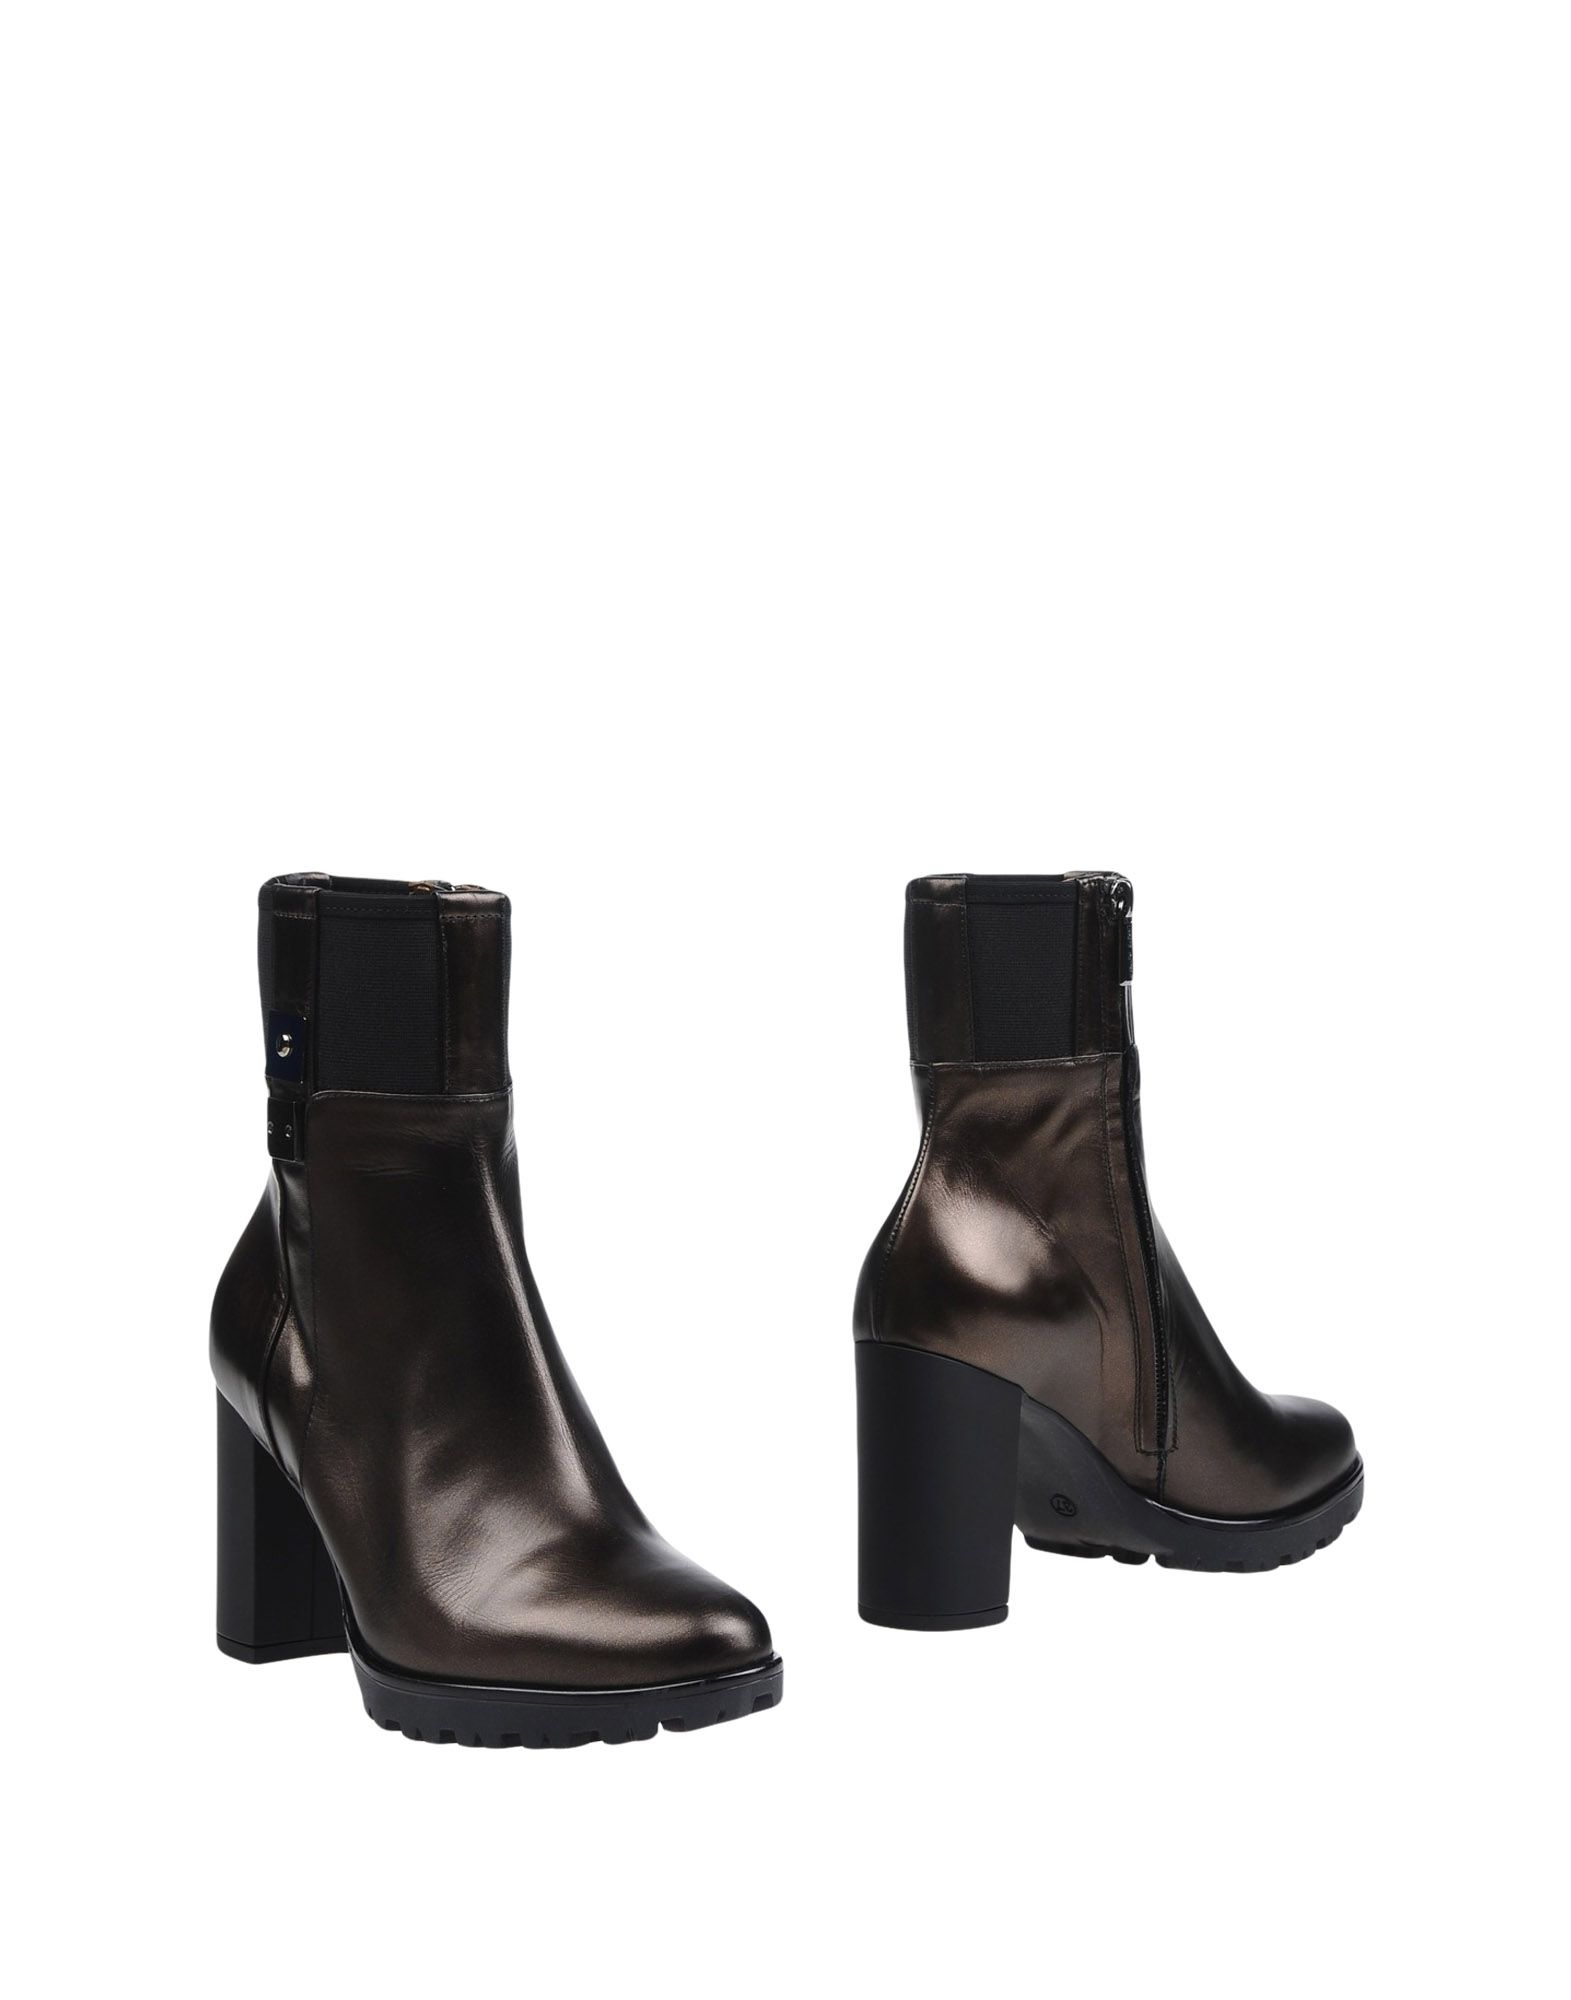 Loretta Pettinari Stiefelette Damen  11254249NS Neue Schuhe